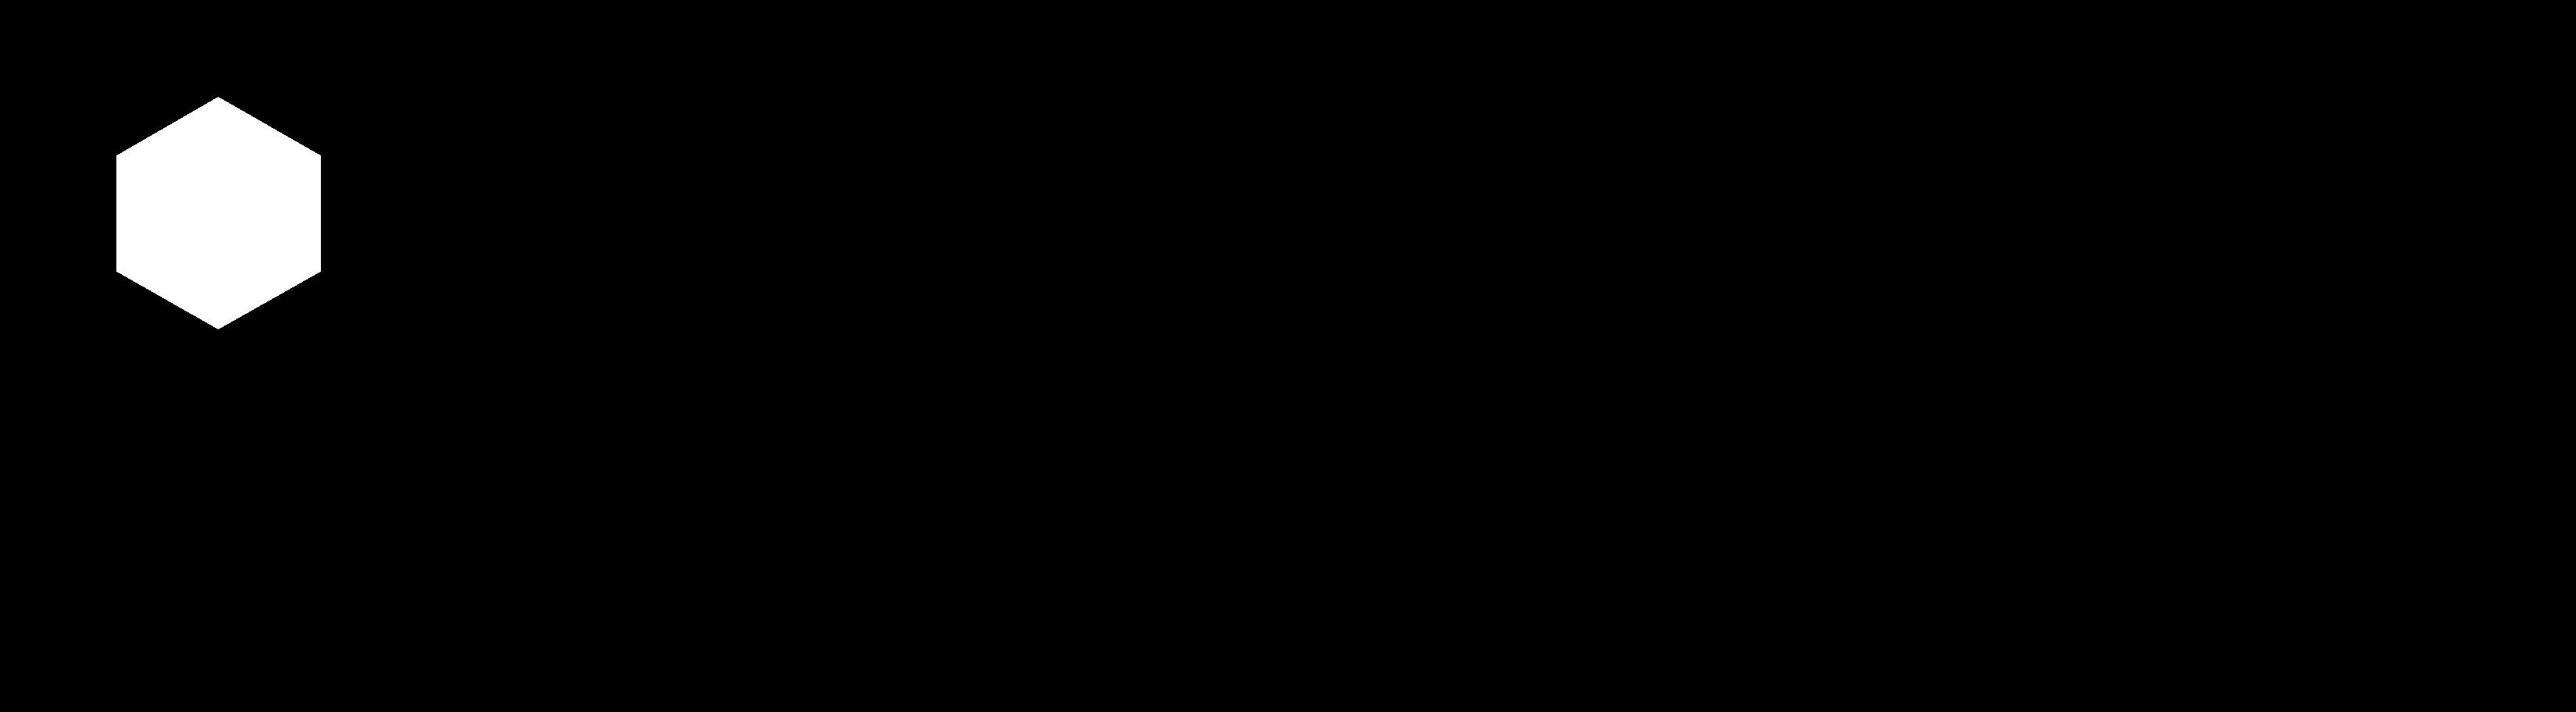 chertezh 5i5 kreptech